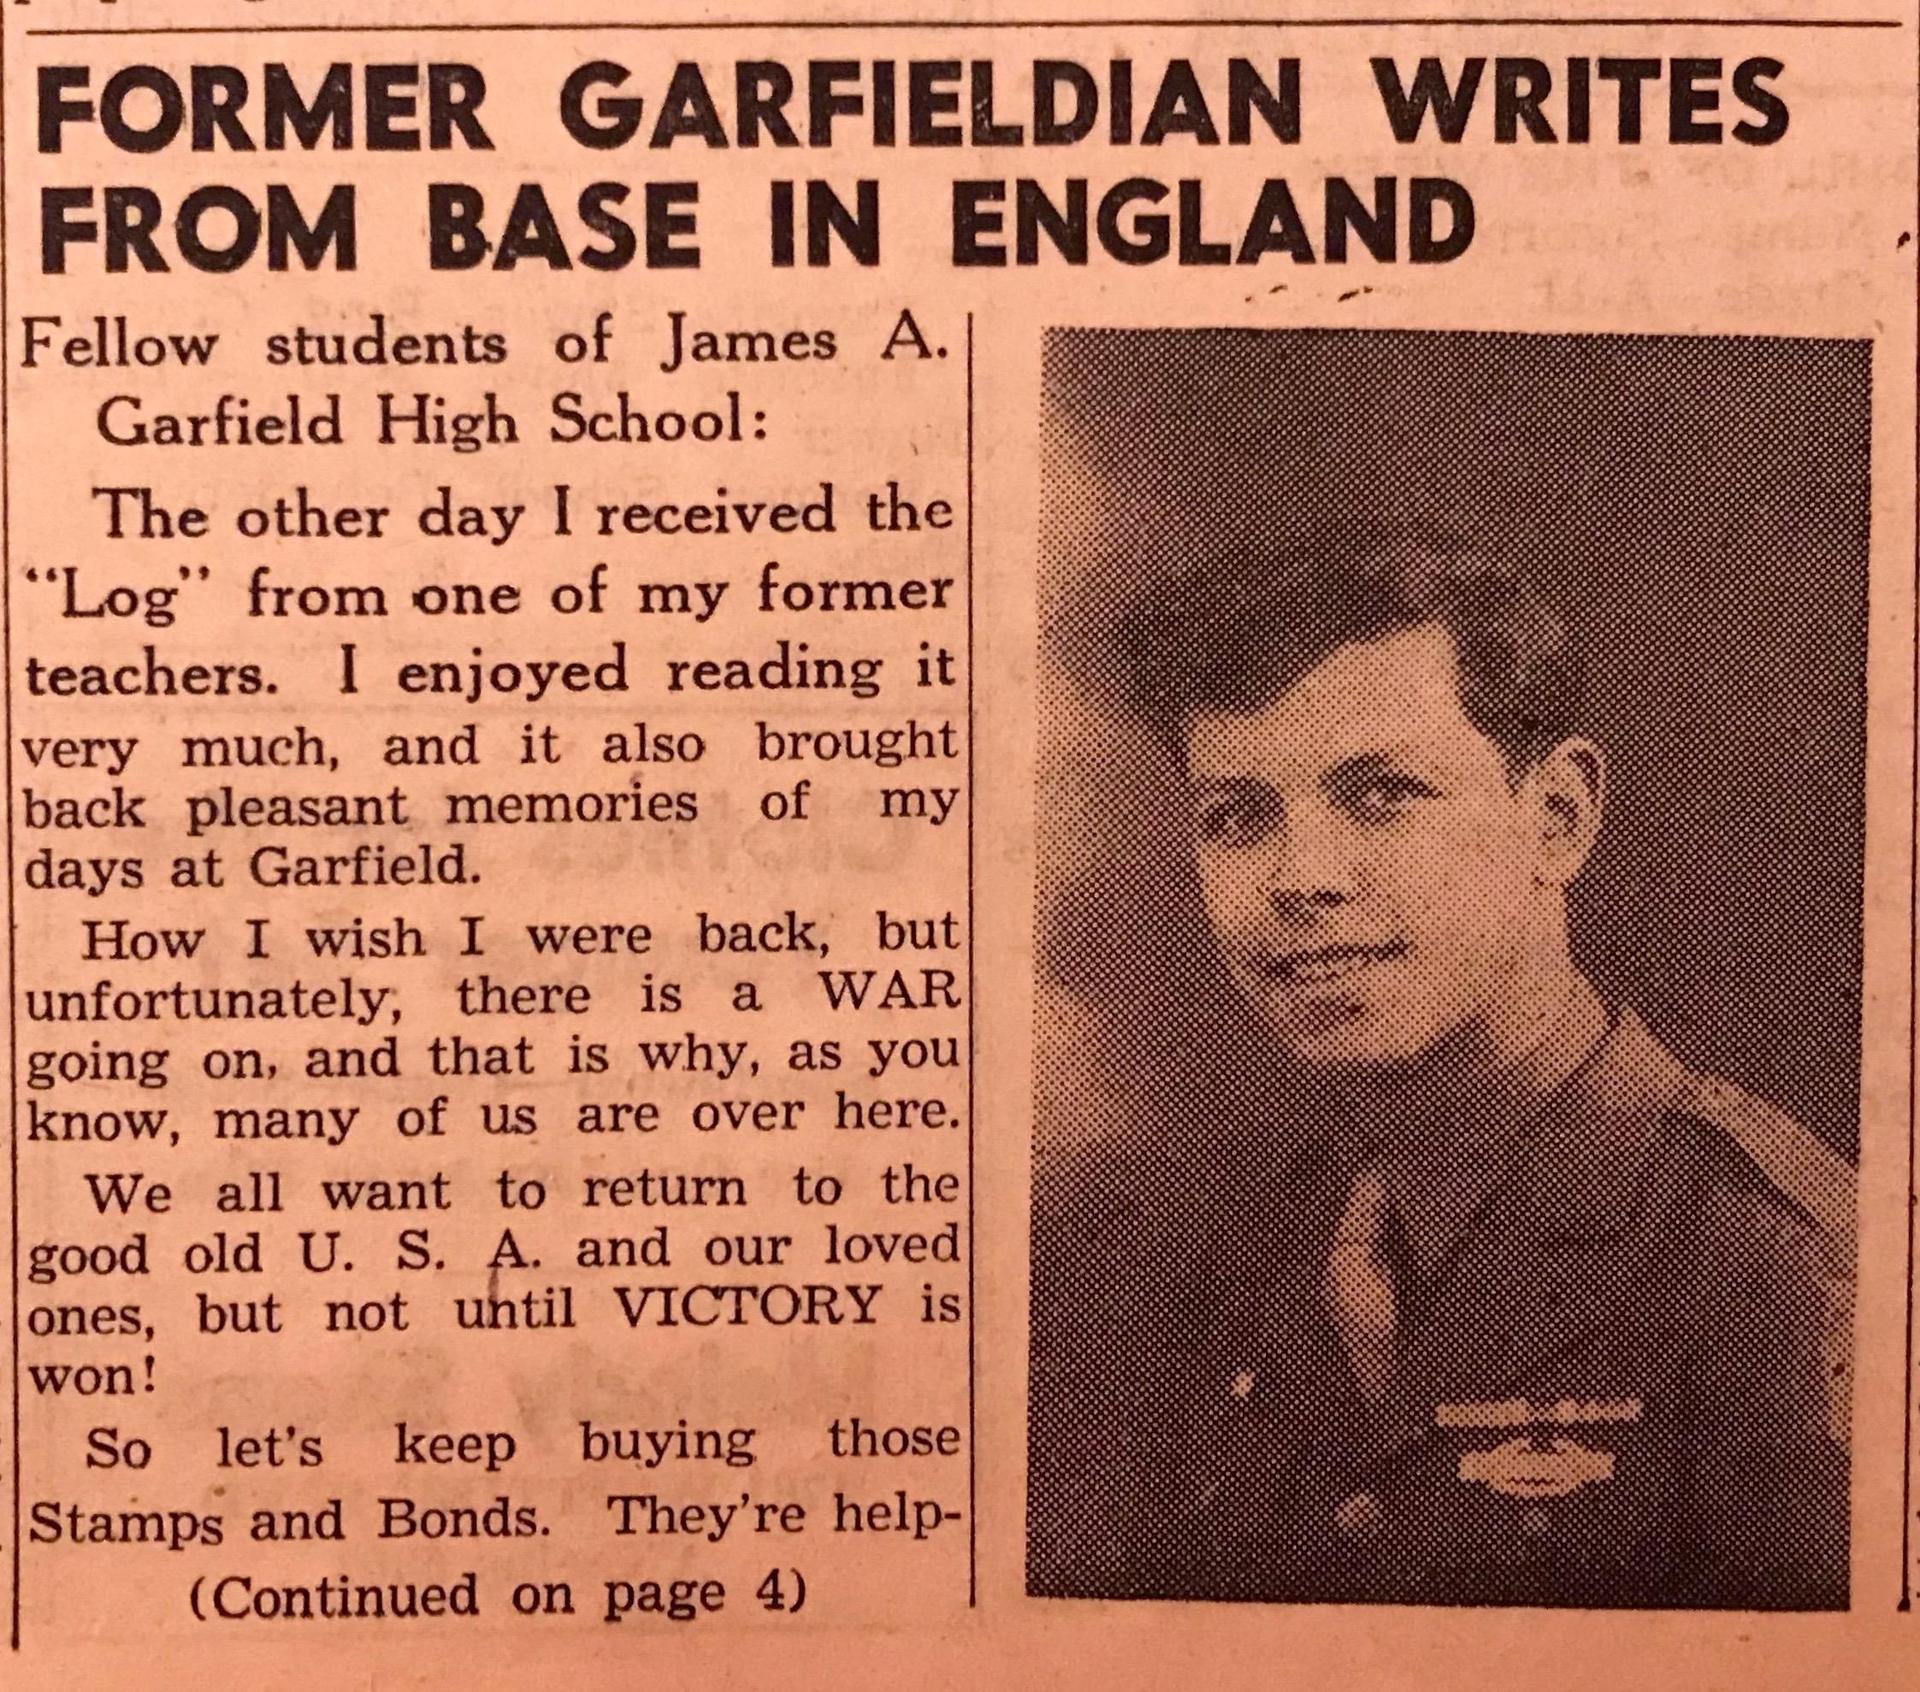 Garfieldian at Base in England